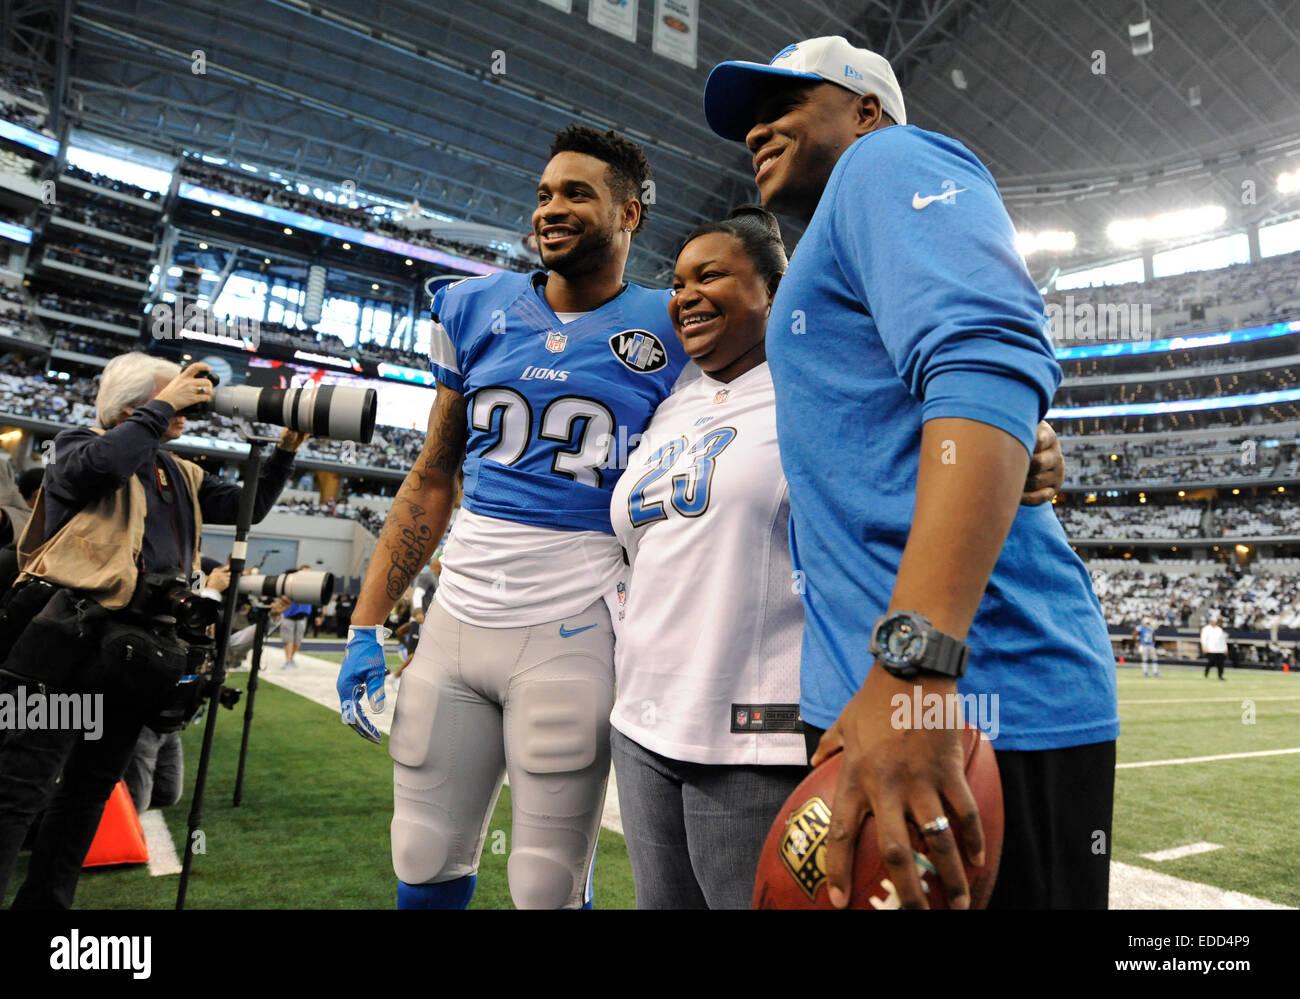 January 04 2015 Detroit Lions cornerback Darius Slay 23 poses